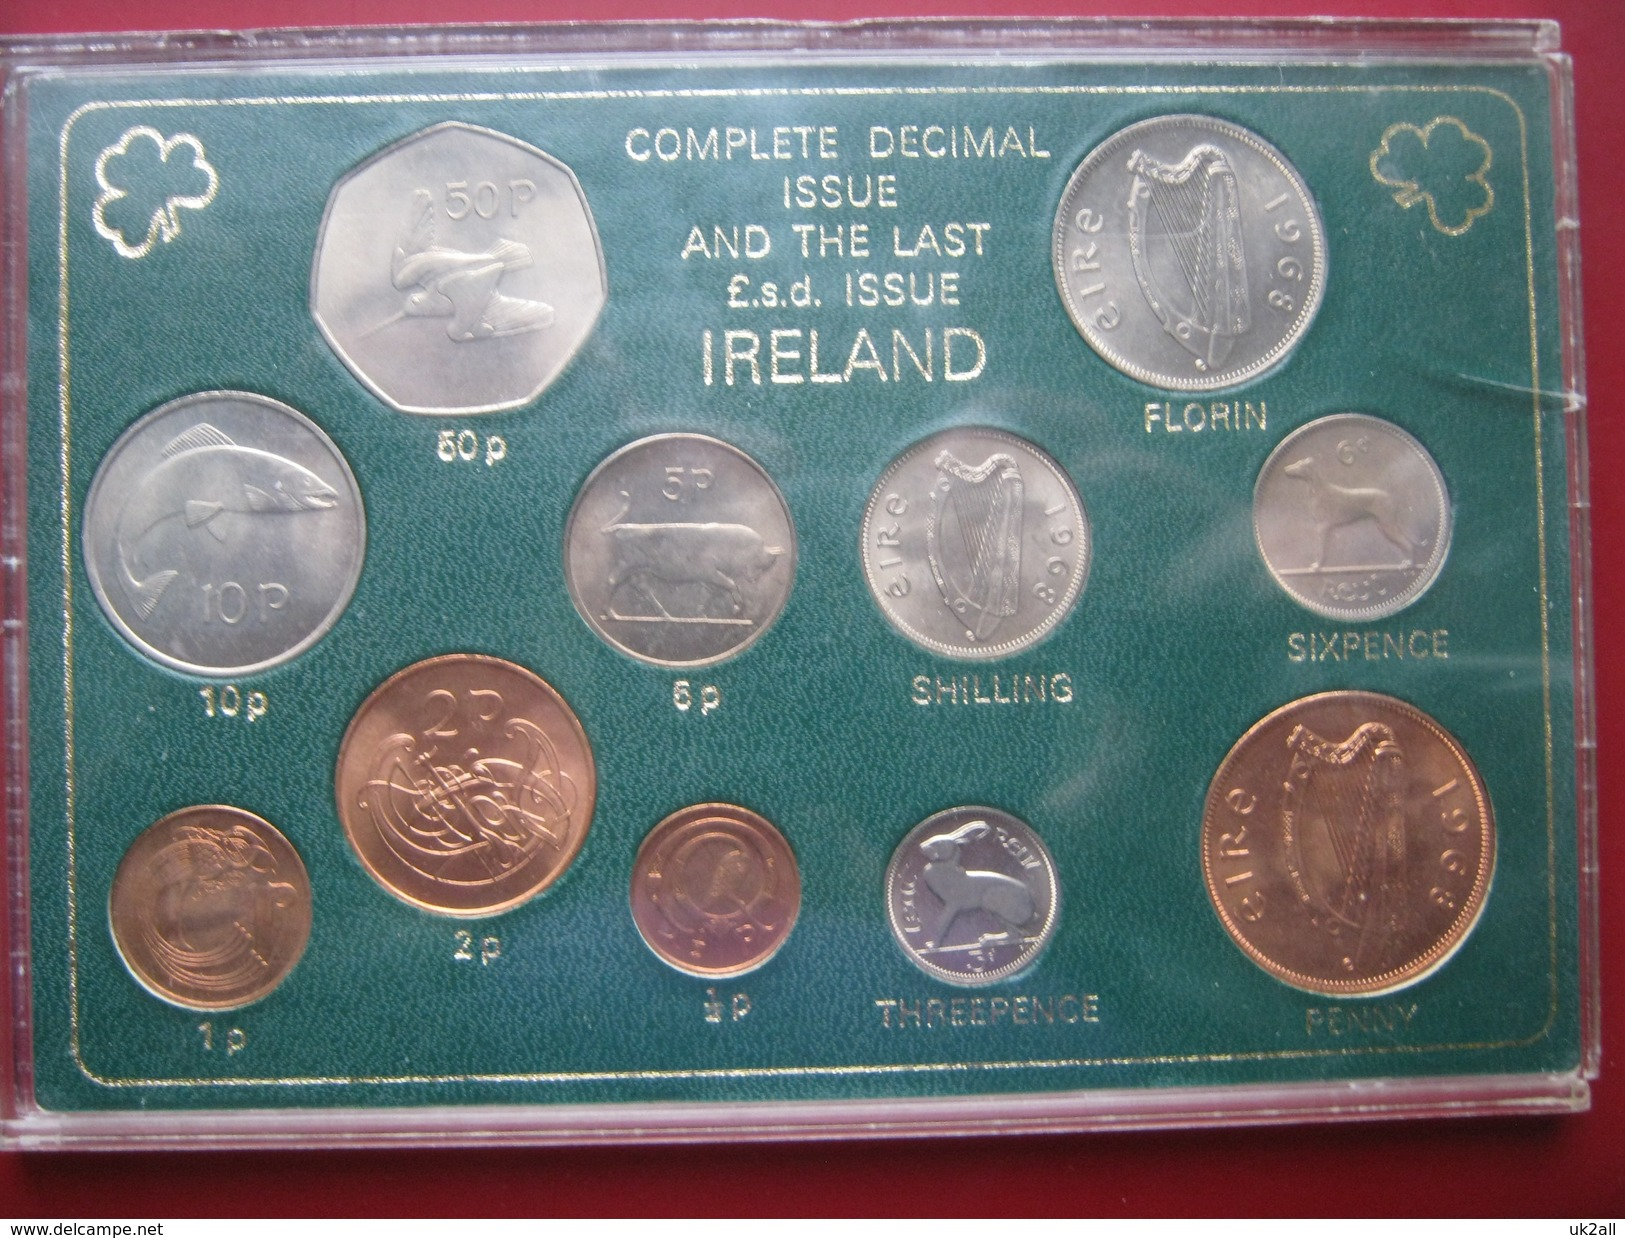 Ireland 1960-s 1970-s Complete Decimal & The Last LSD Issue UNC 11 Coin Set Cased - Ireland